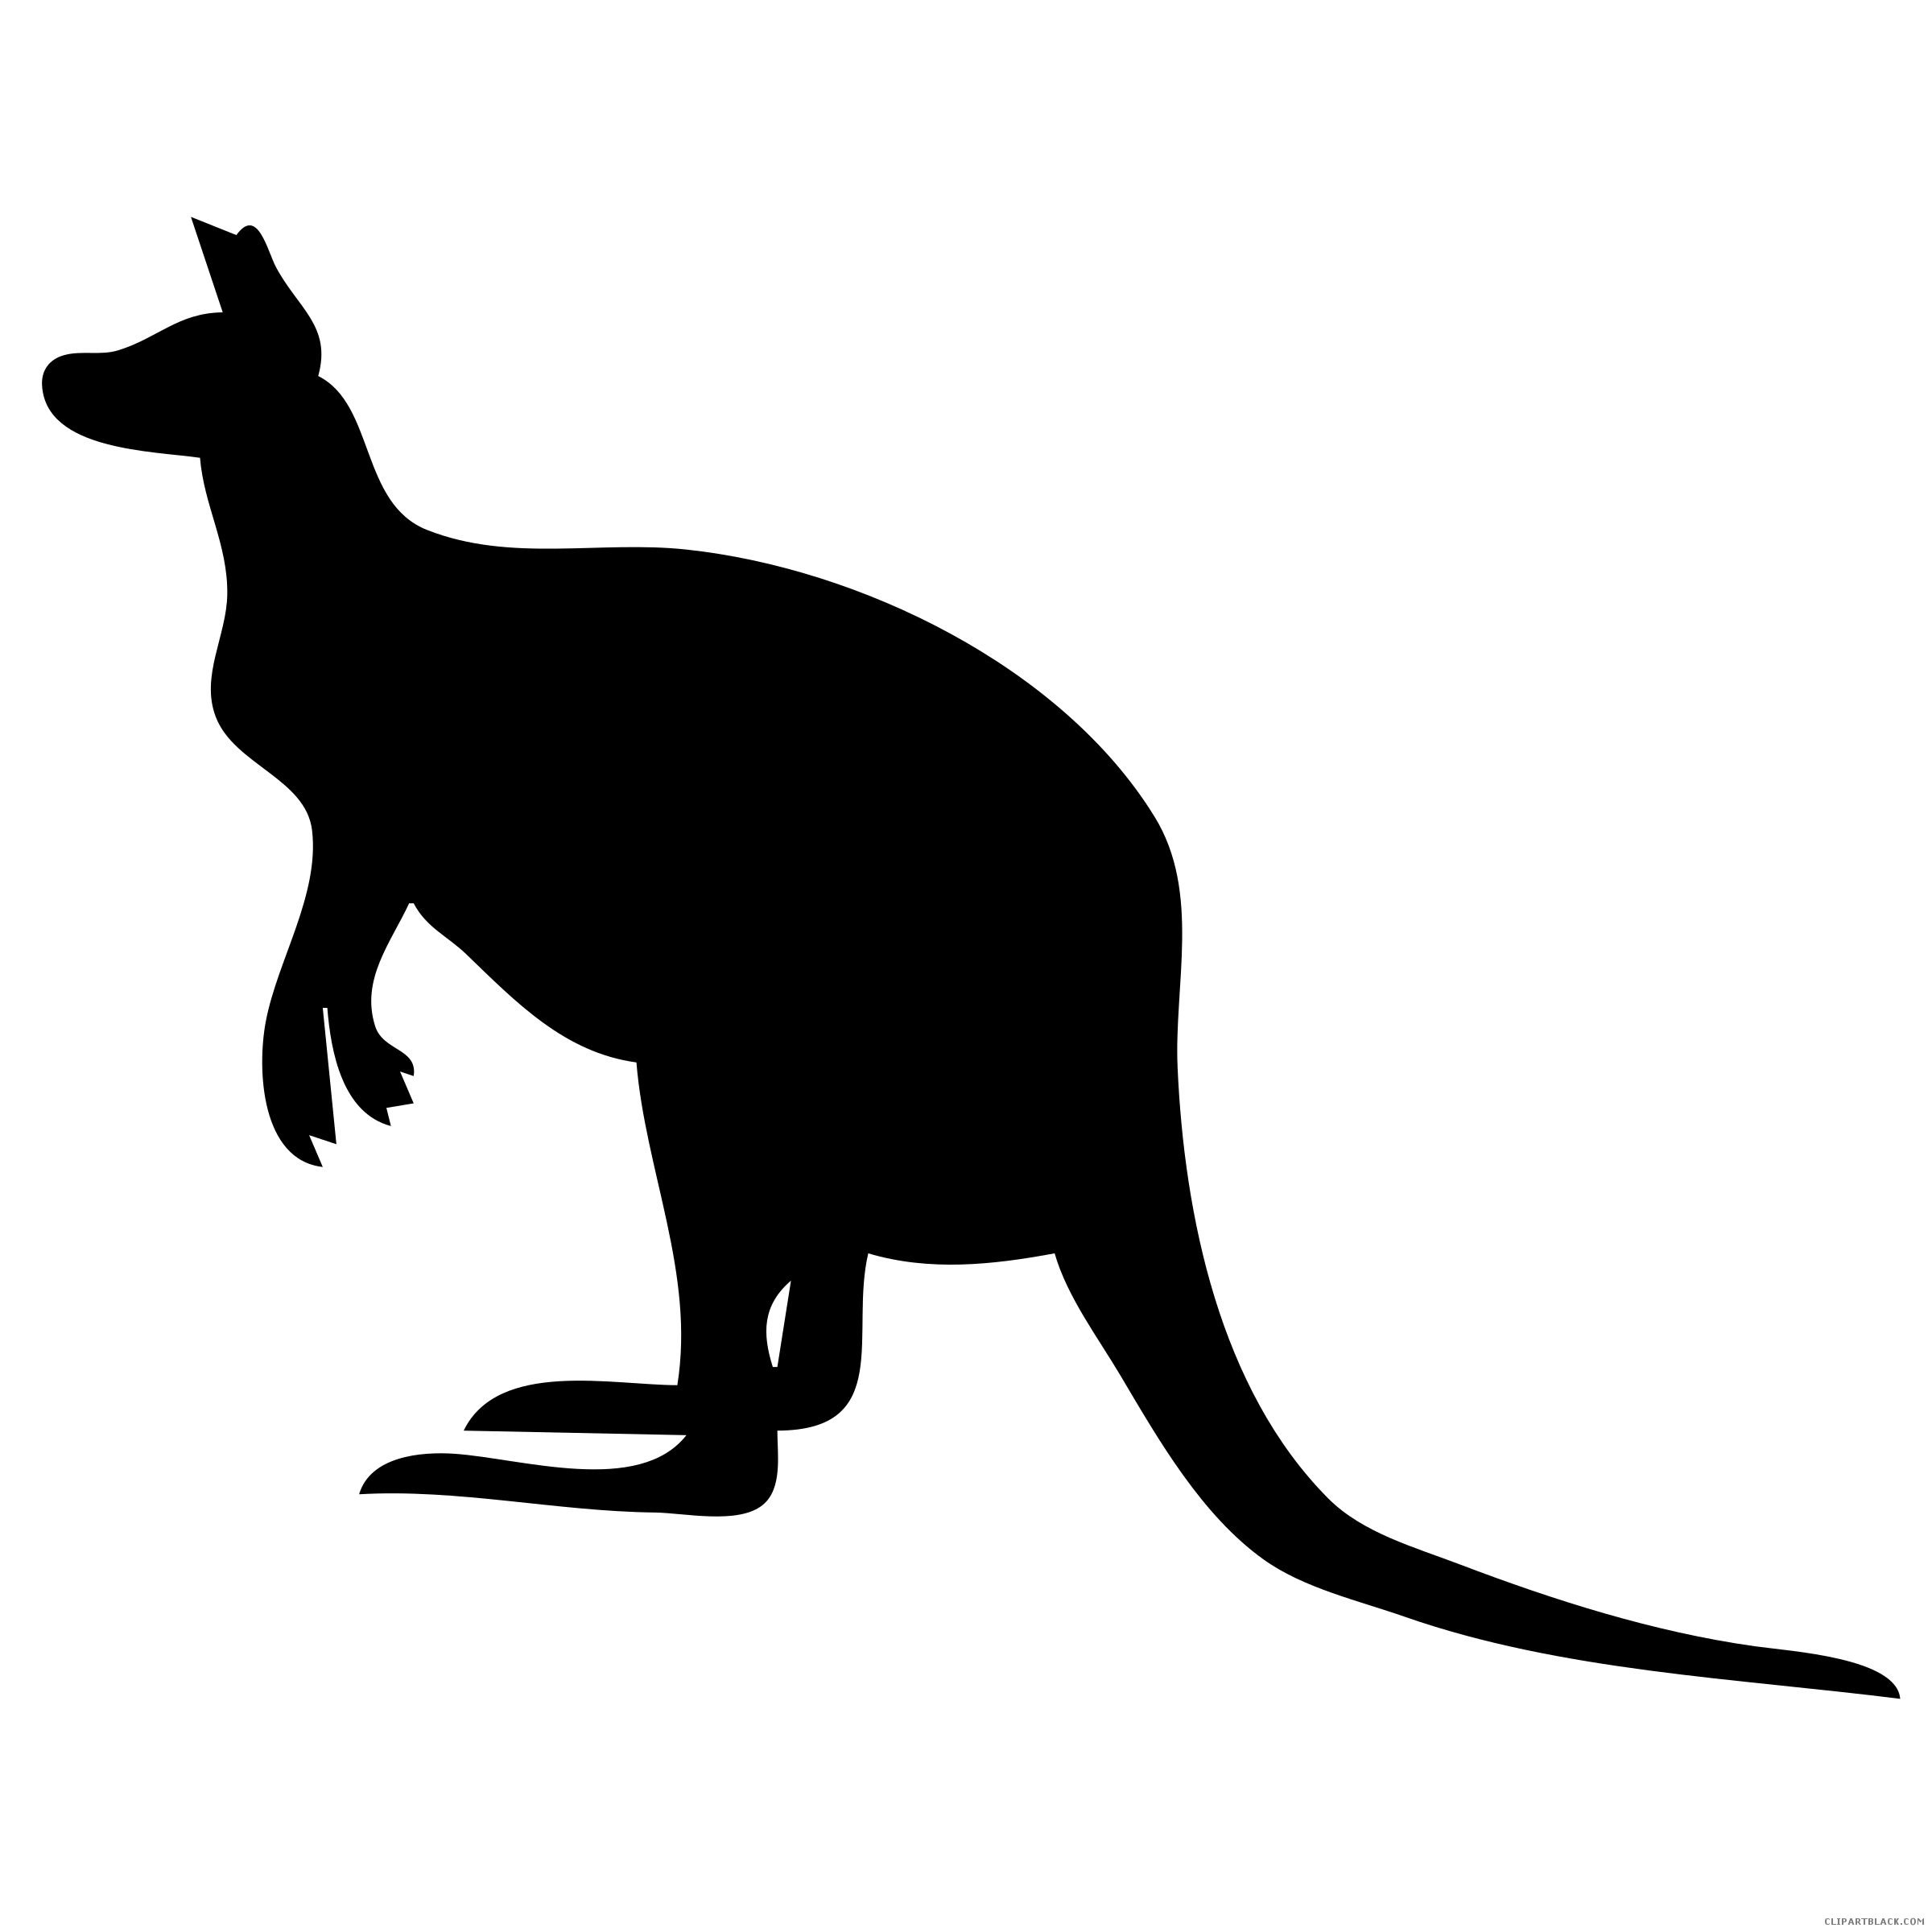 Clipartblack com animal free. Kangaroo clipart silhouette